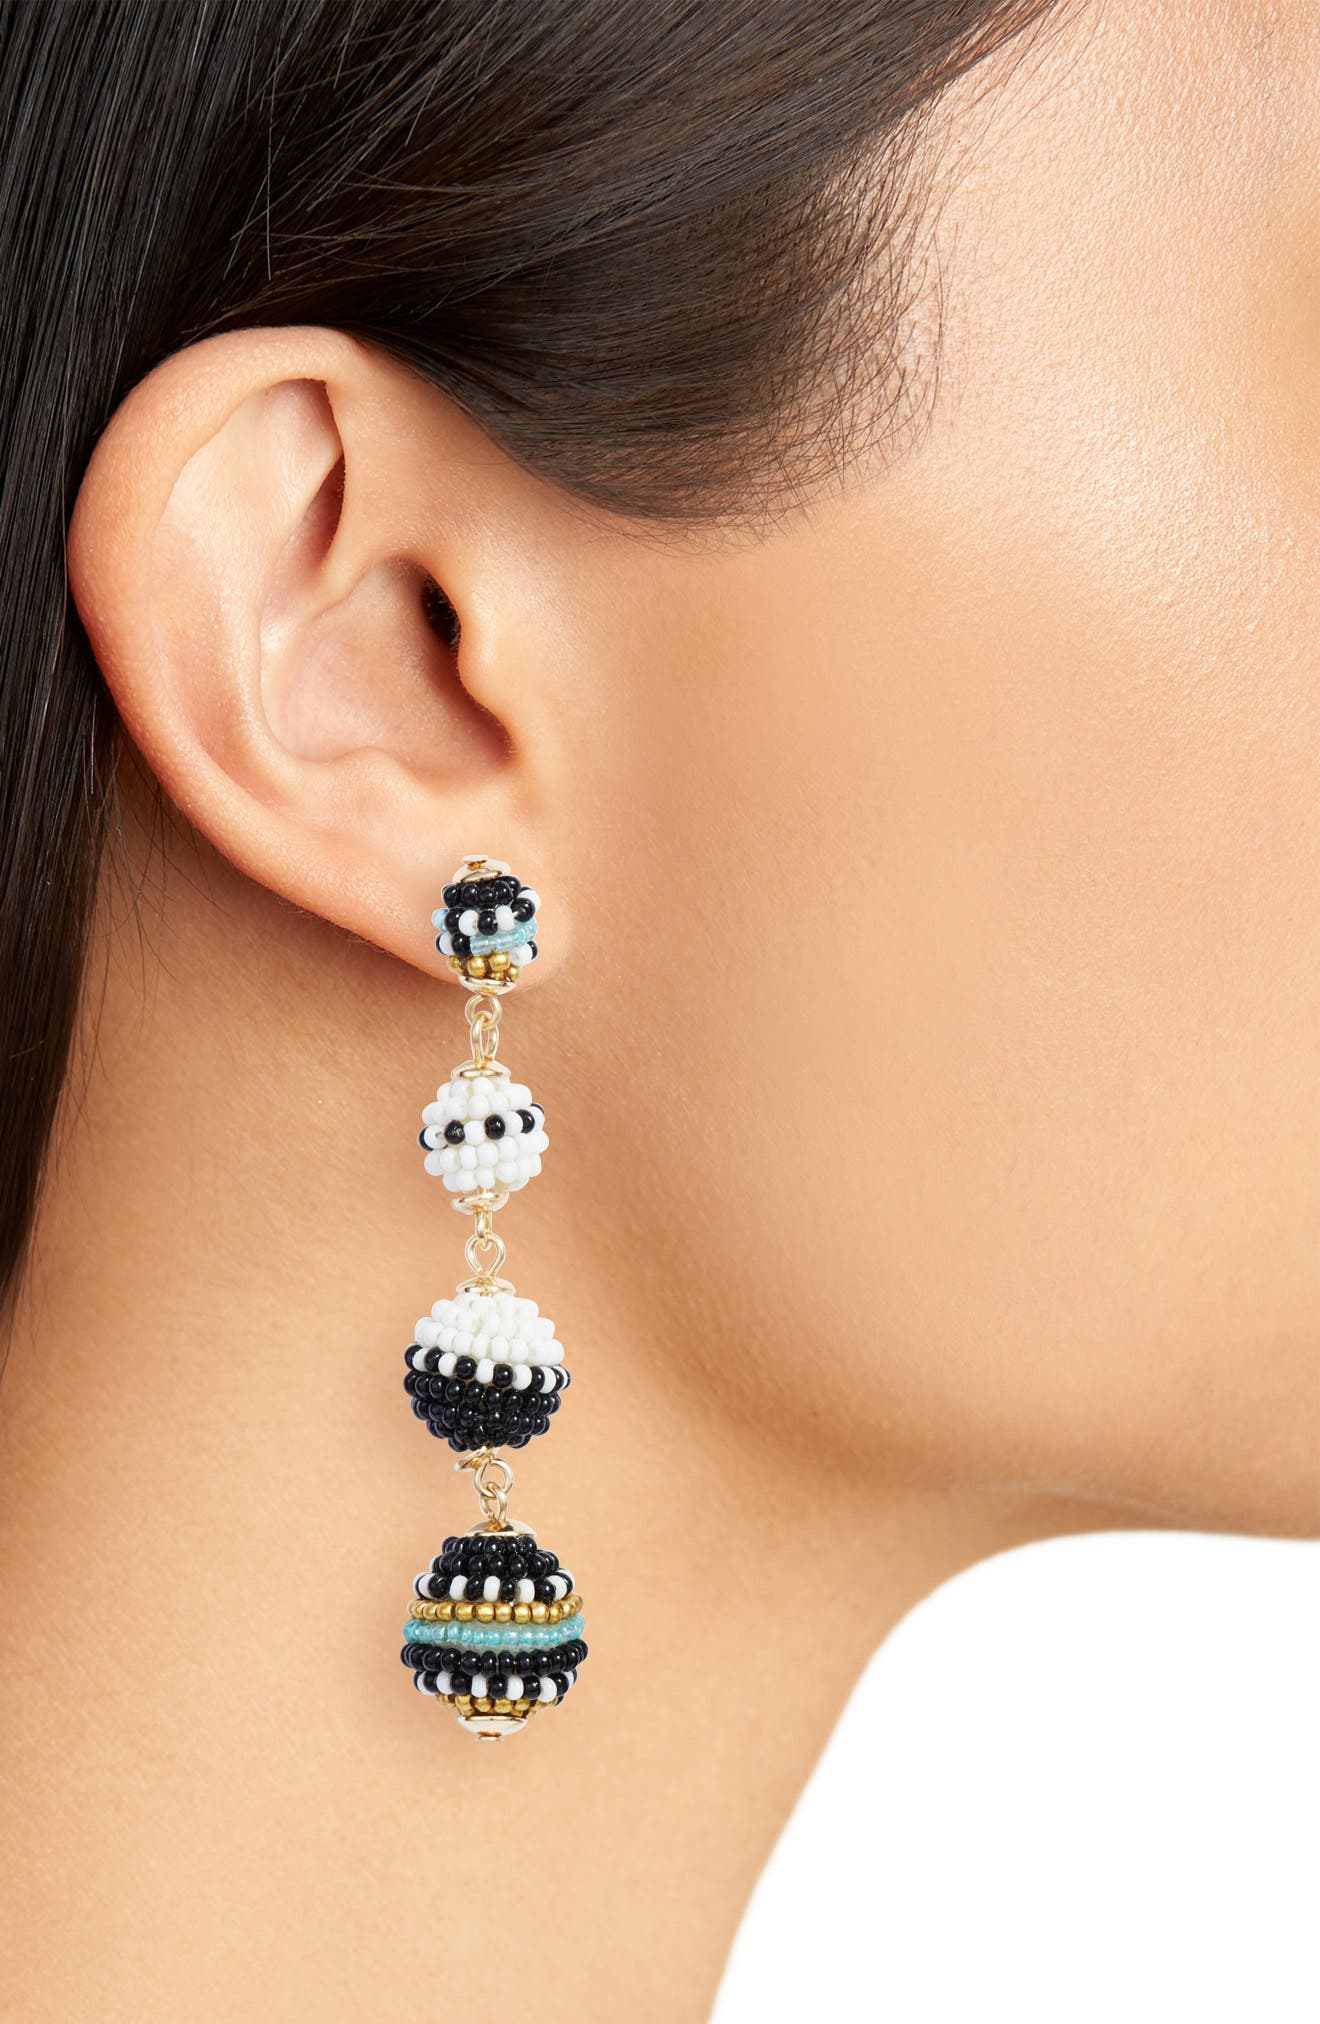 Blair Beaded Ball Drop Earrings,                             Alternate thumbnail 2, color,                             Black/ White Multi